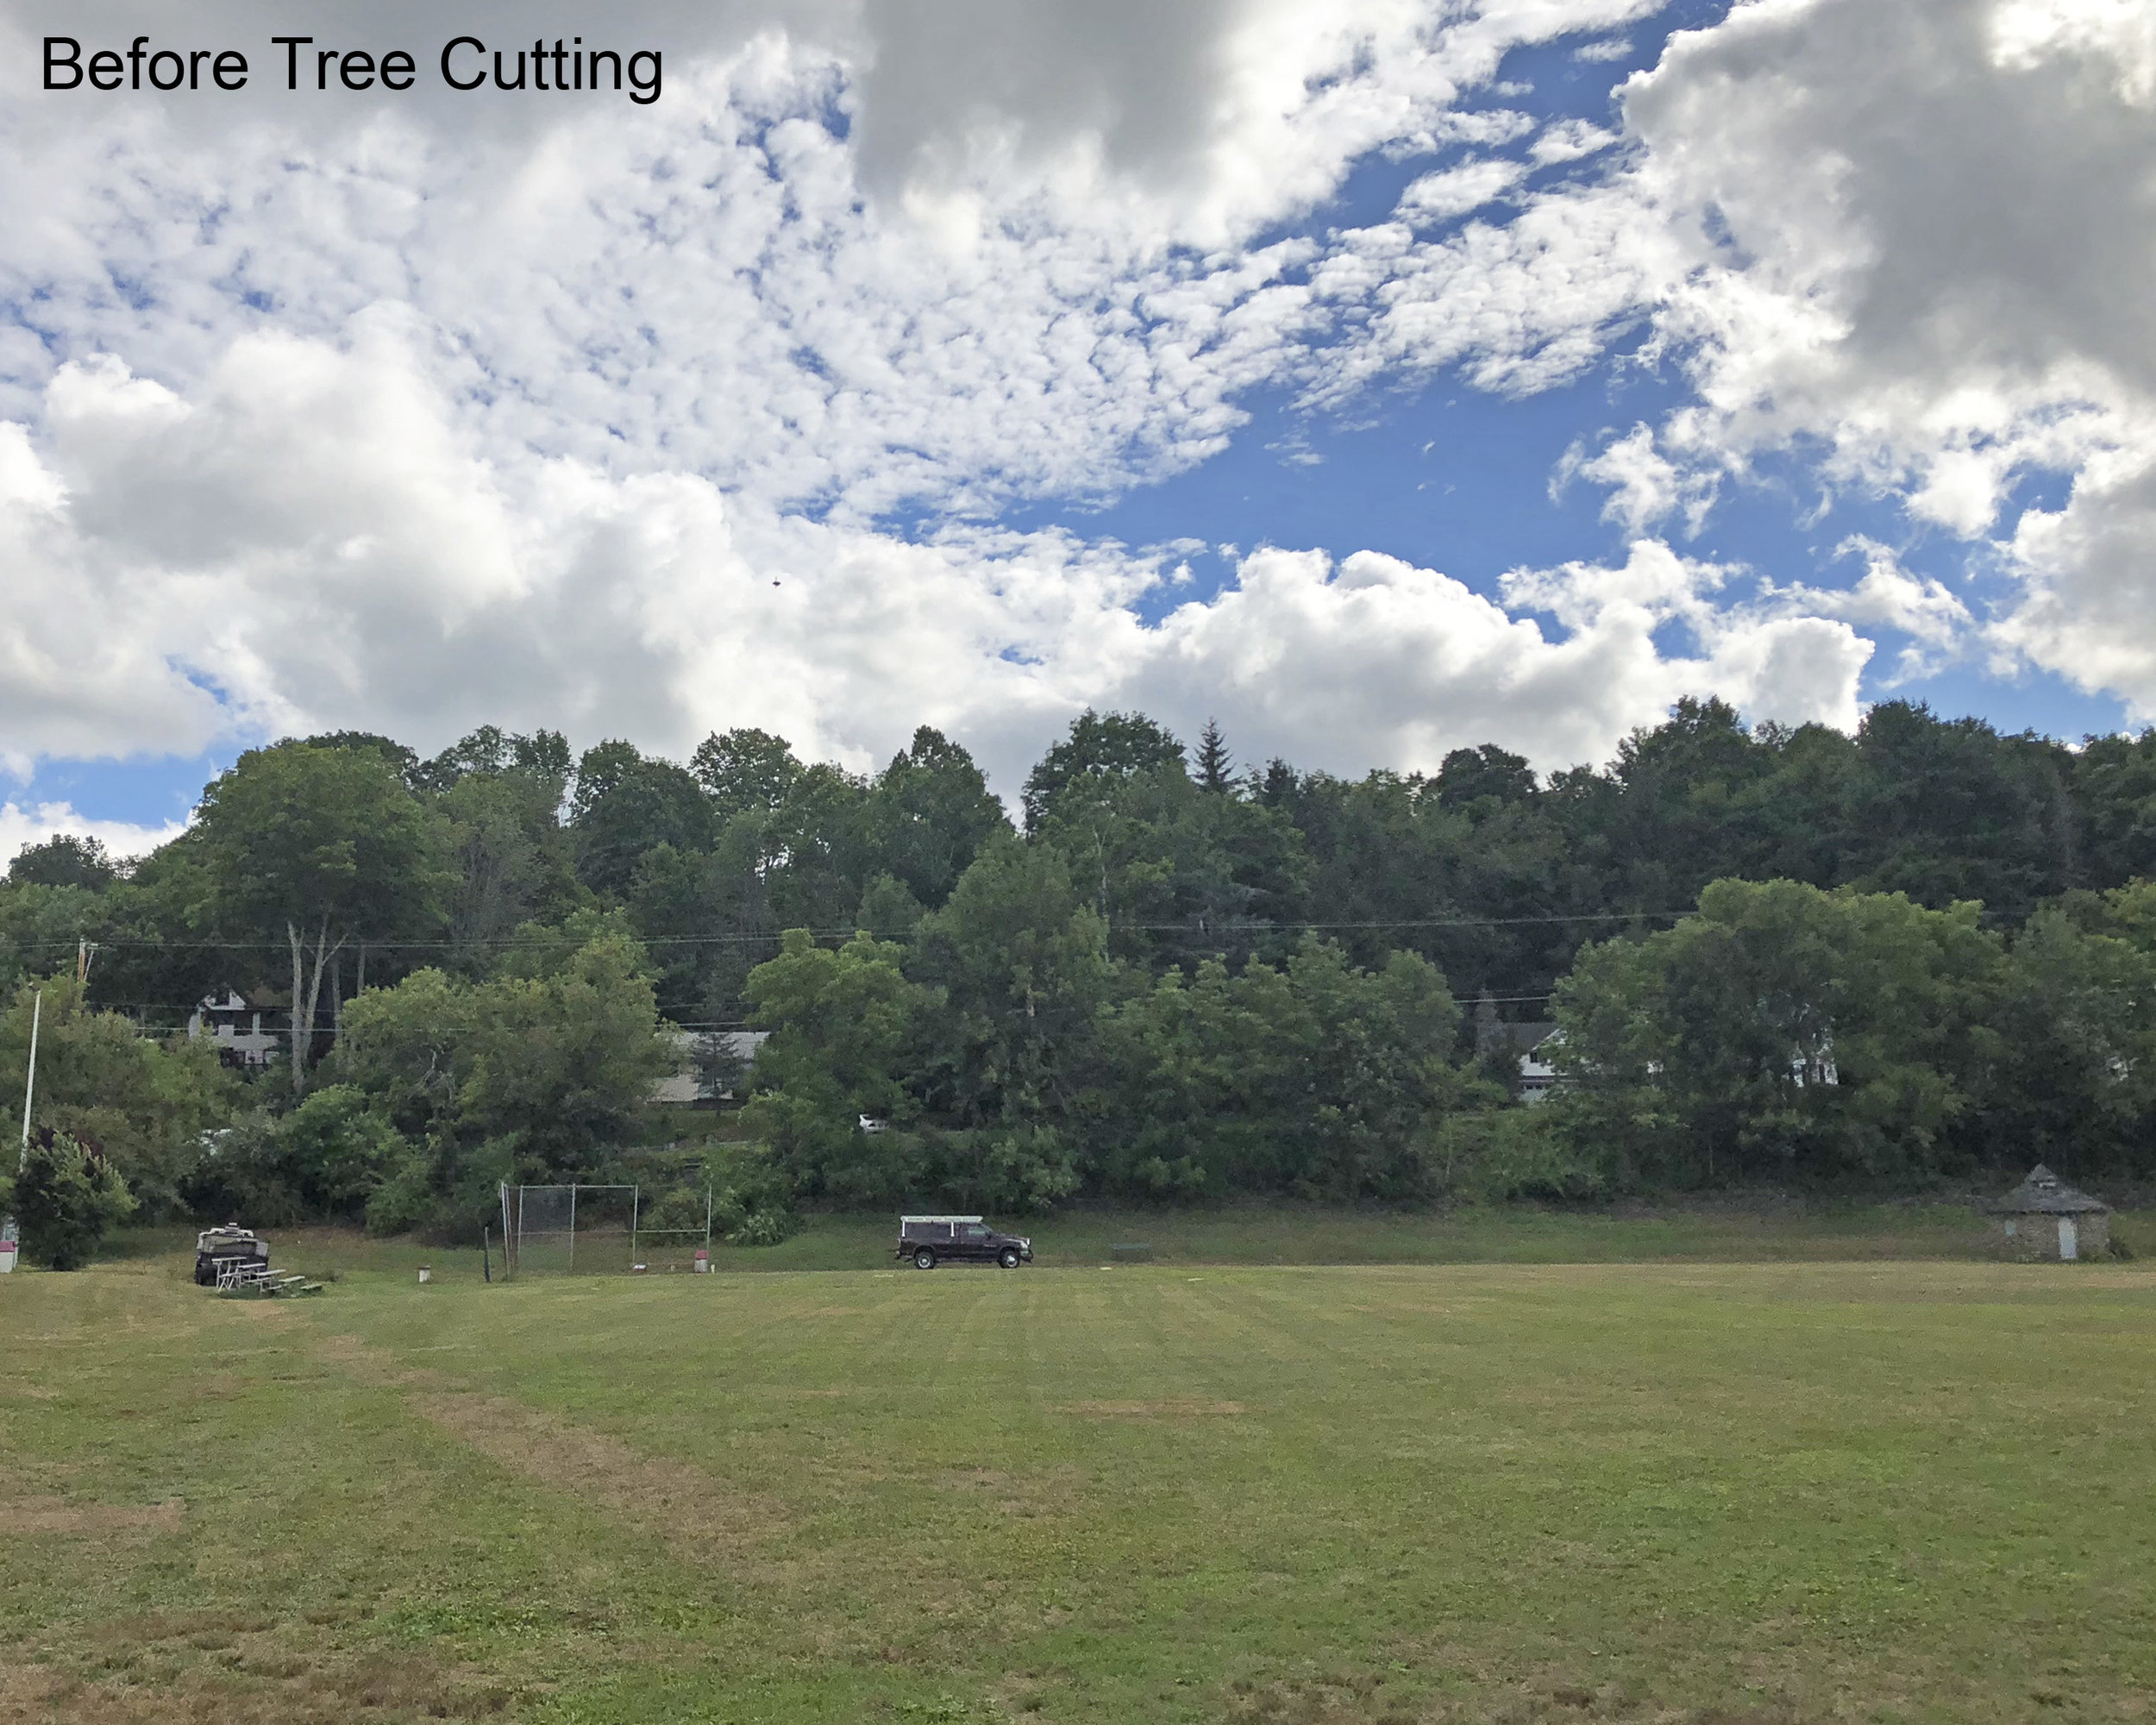 Before Tree Cutting.jpg